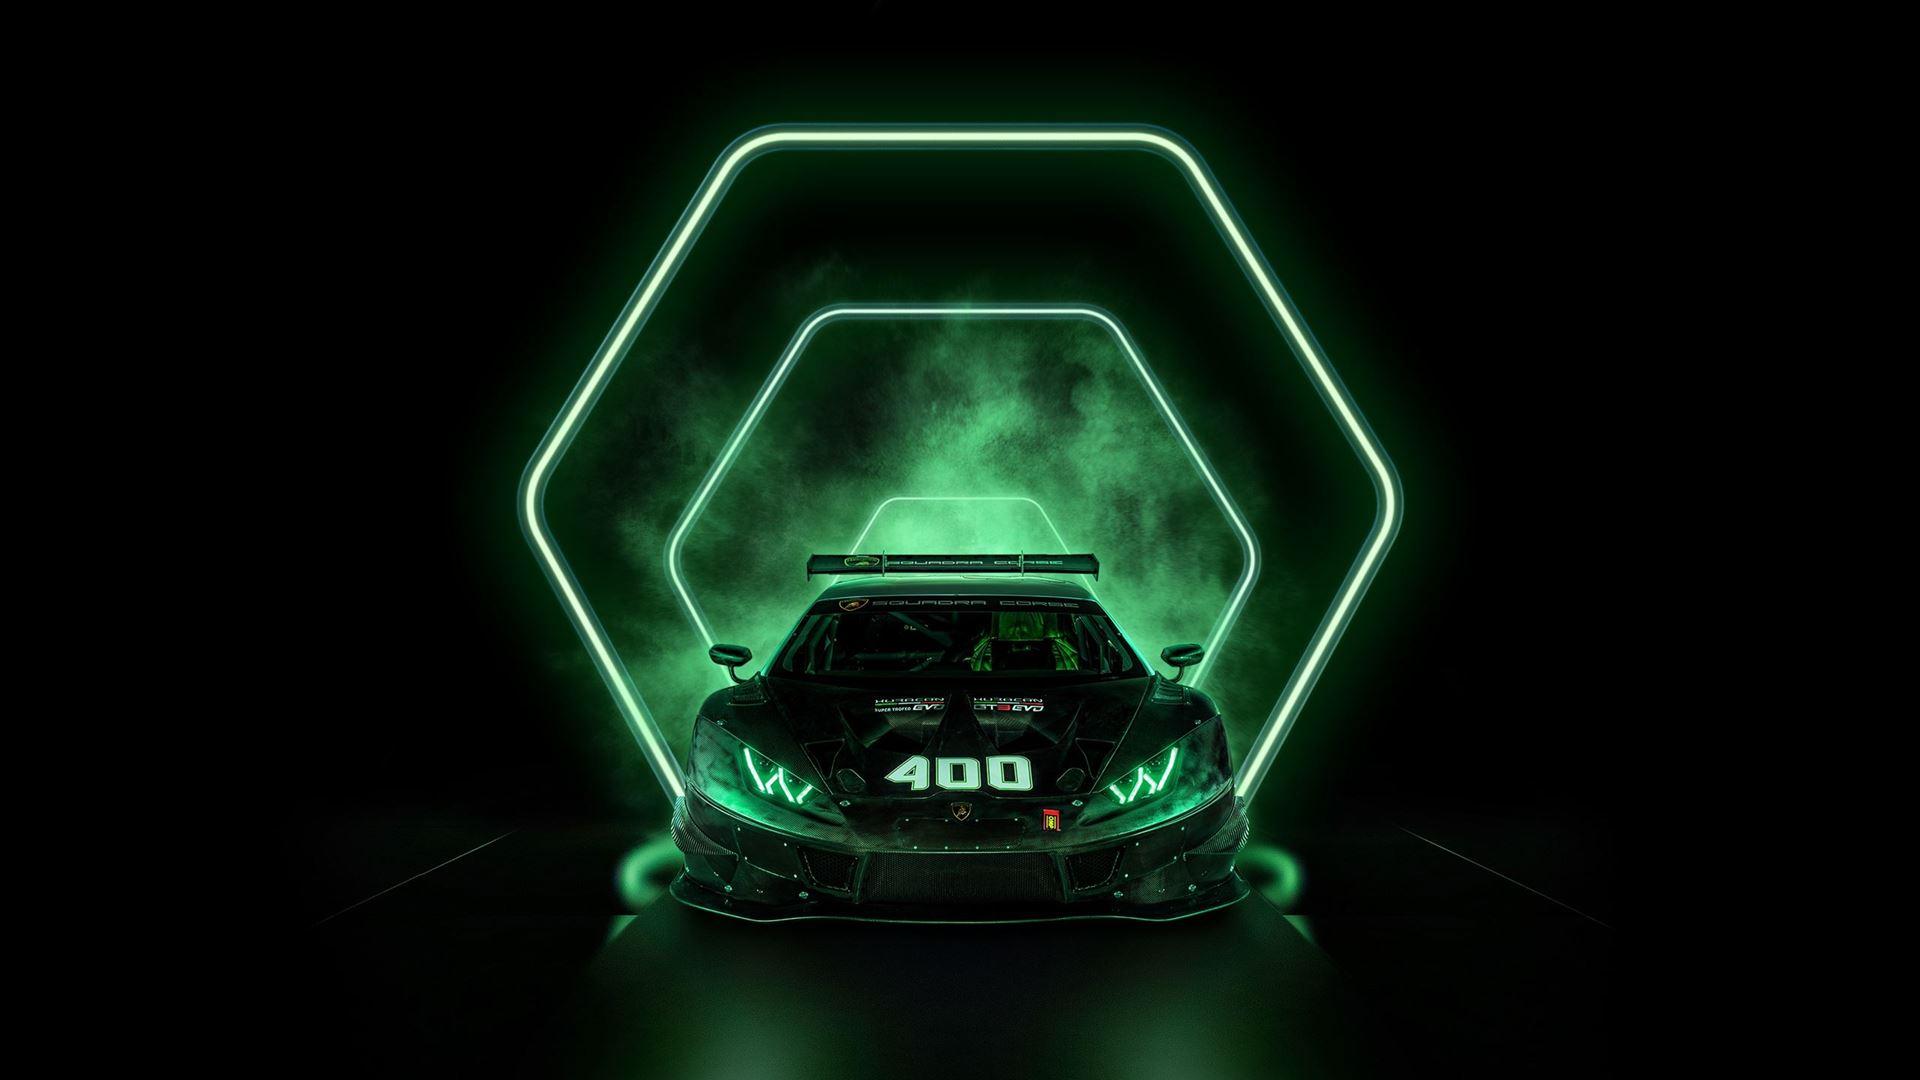 Lamborghini celebrates production of the 400th Huracán racing car - Image 4